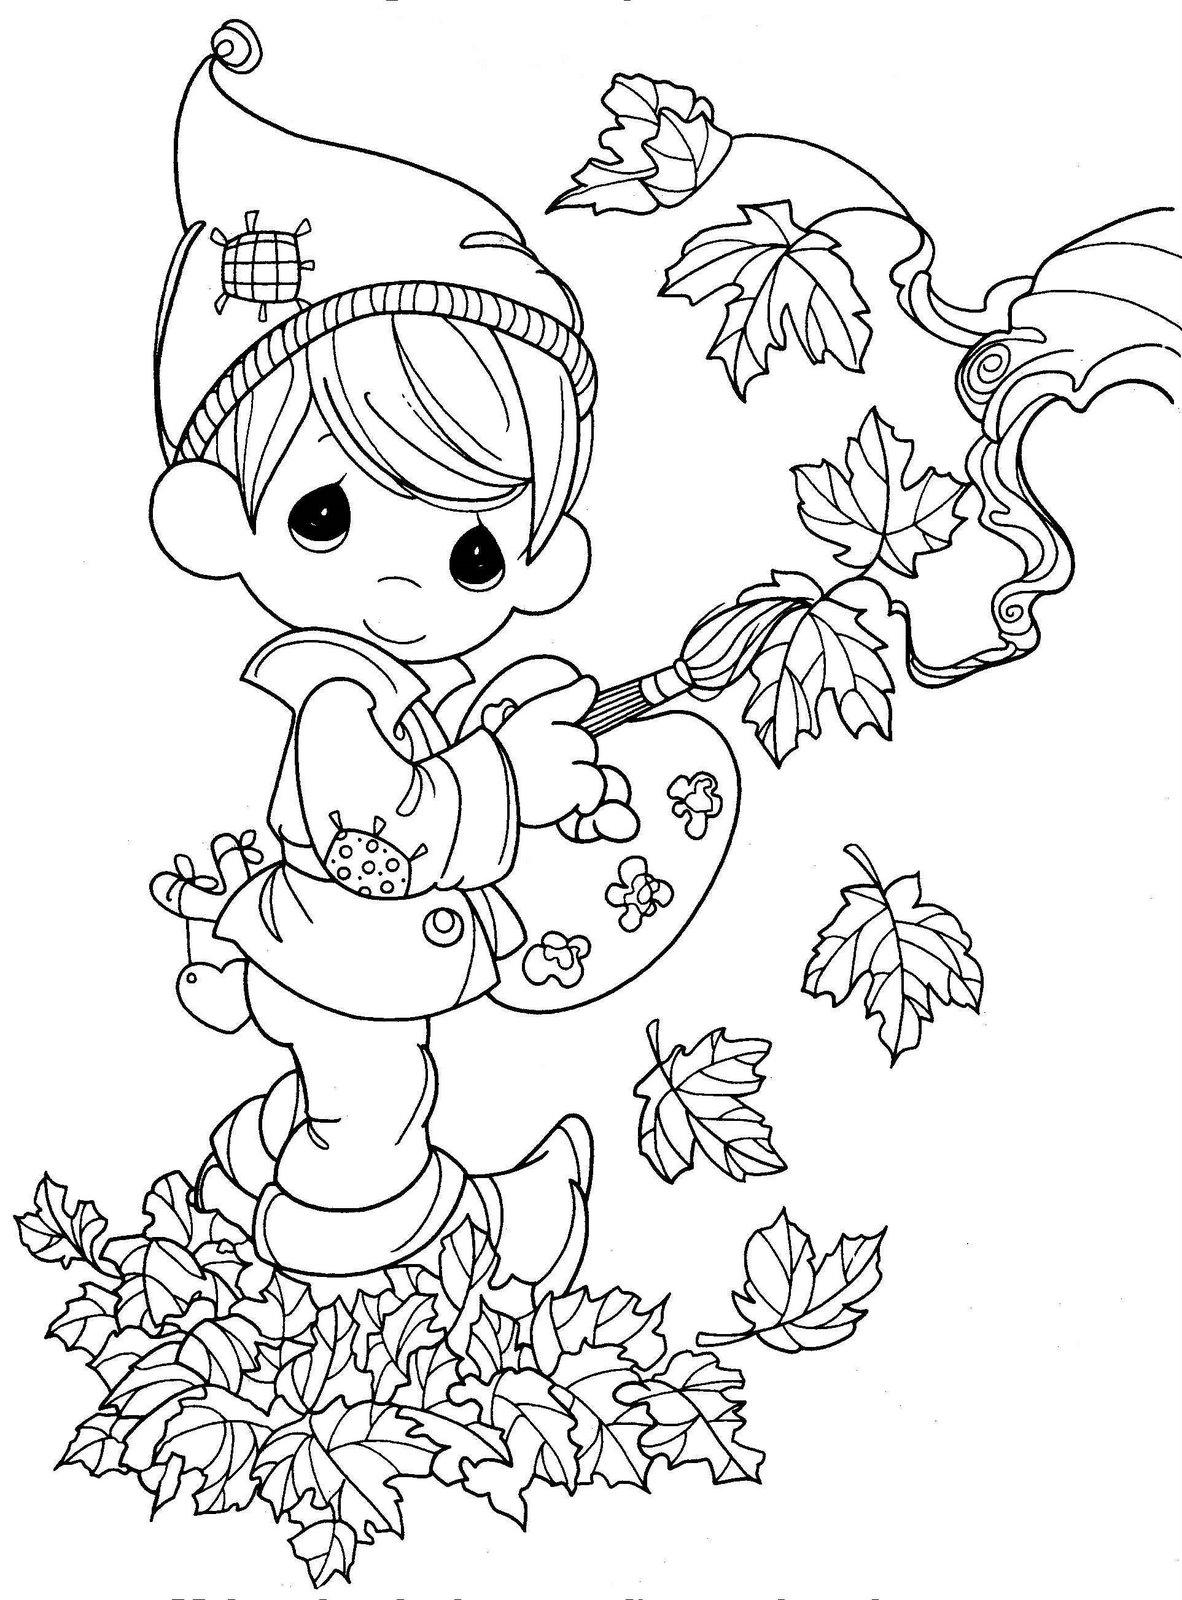 Fall Season Drawing at GetDrawings.com | Free for personal use Fall ...